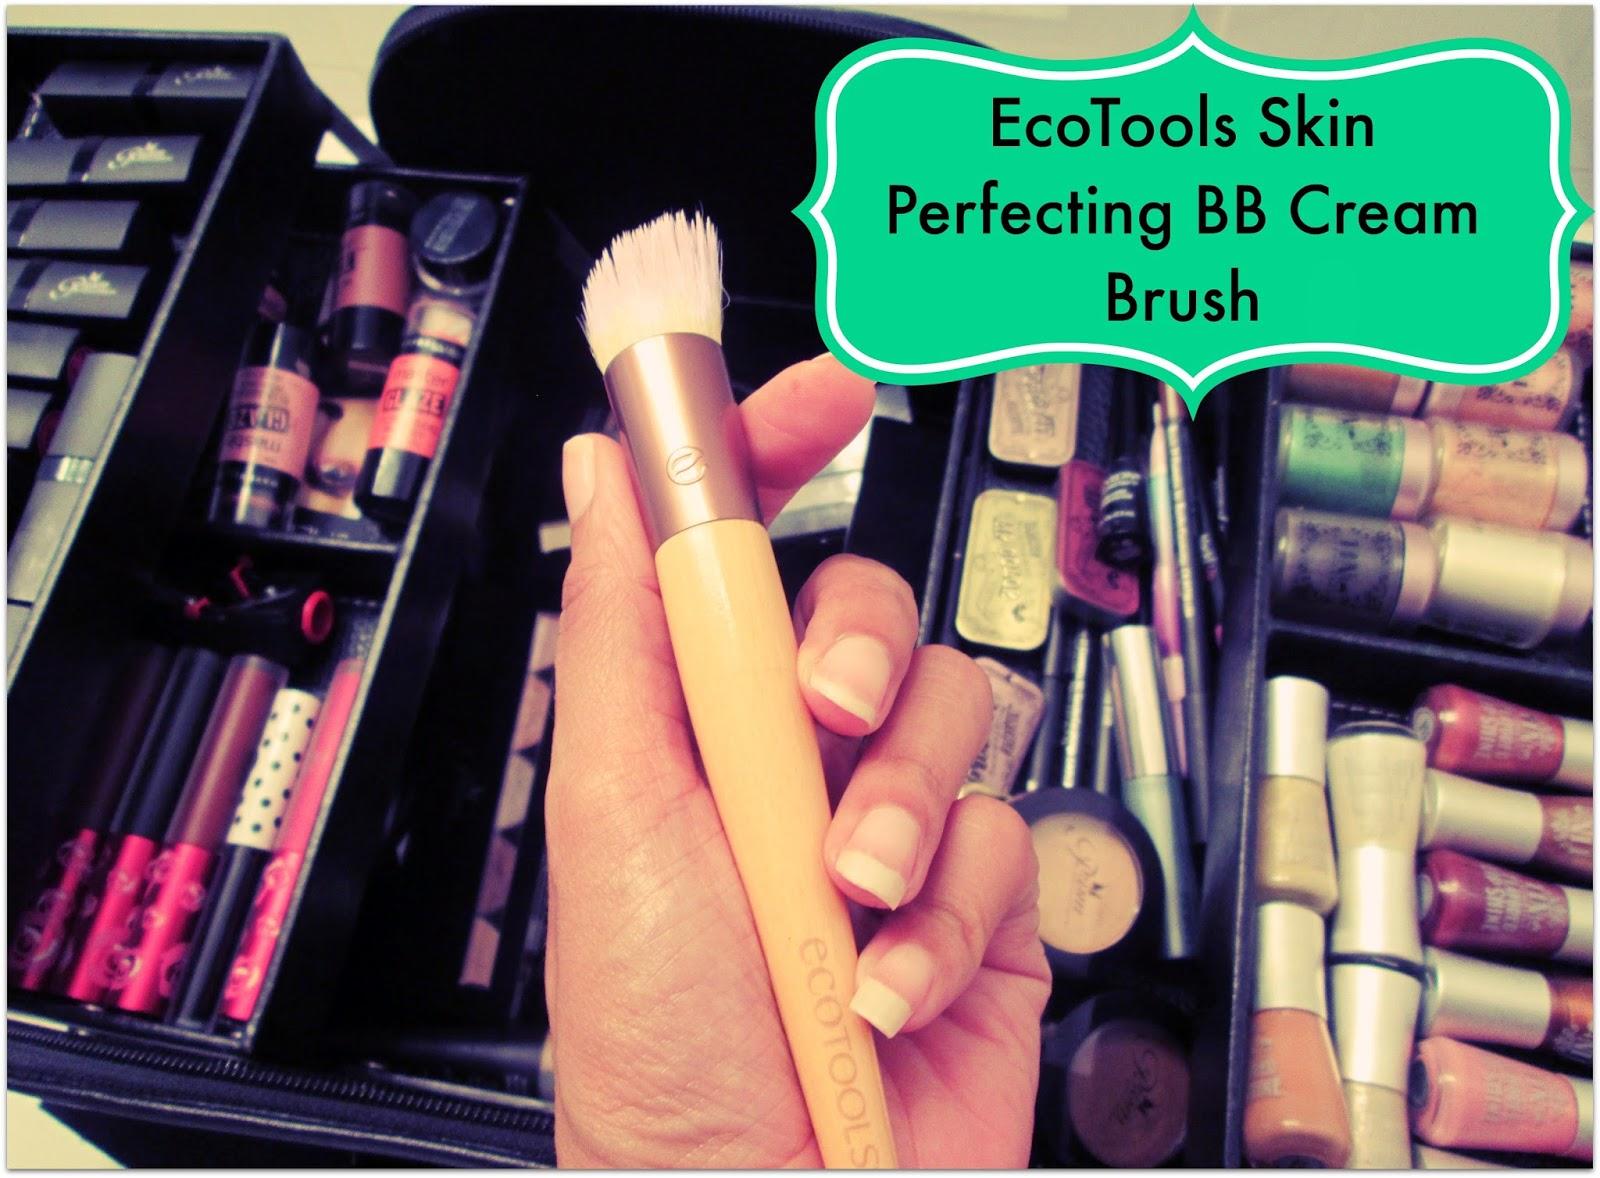 http://chrysalisbeautybag.blogspot.com/2014/11/professional-kit-additions-ecotools.html